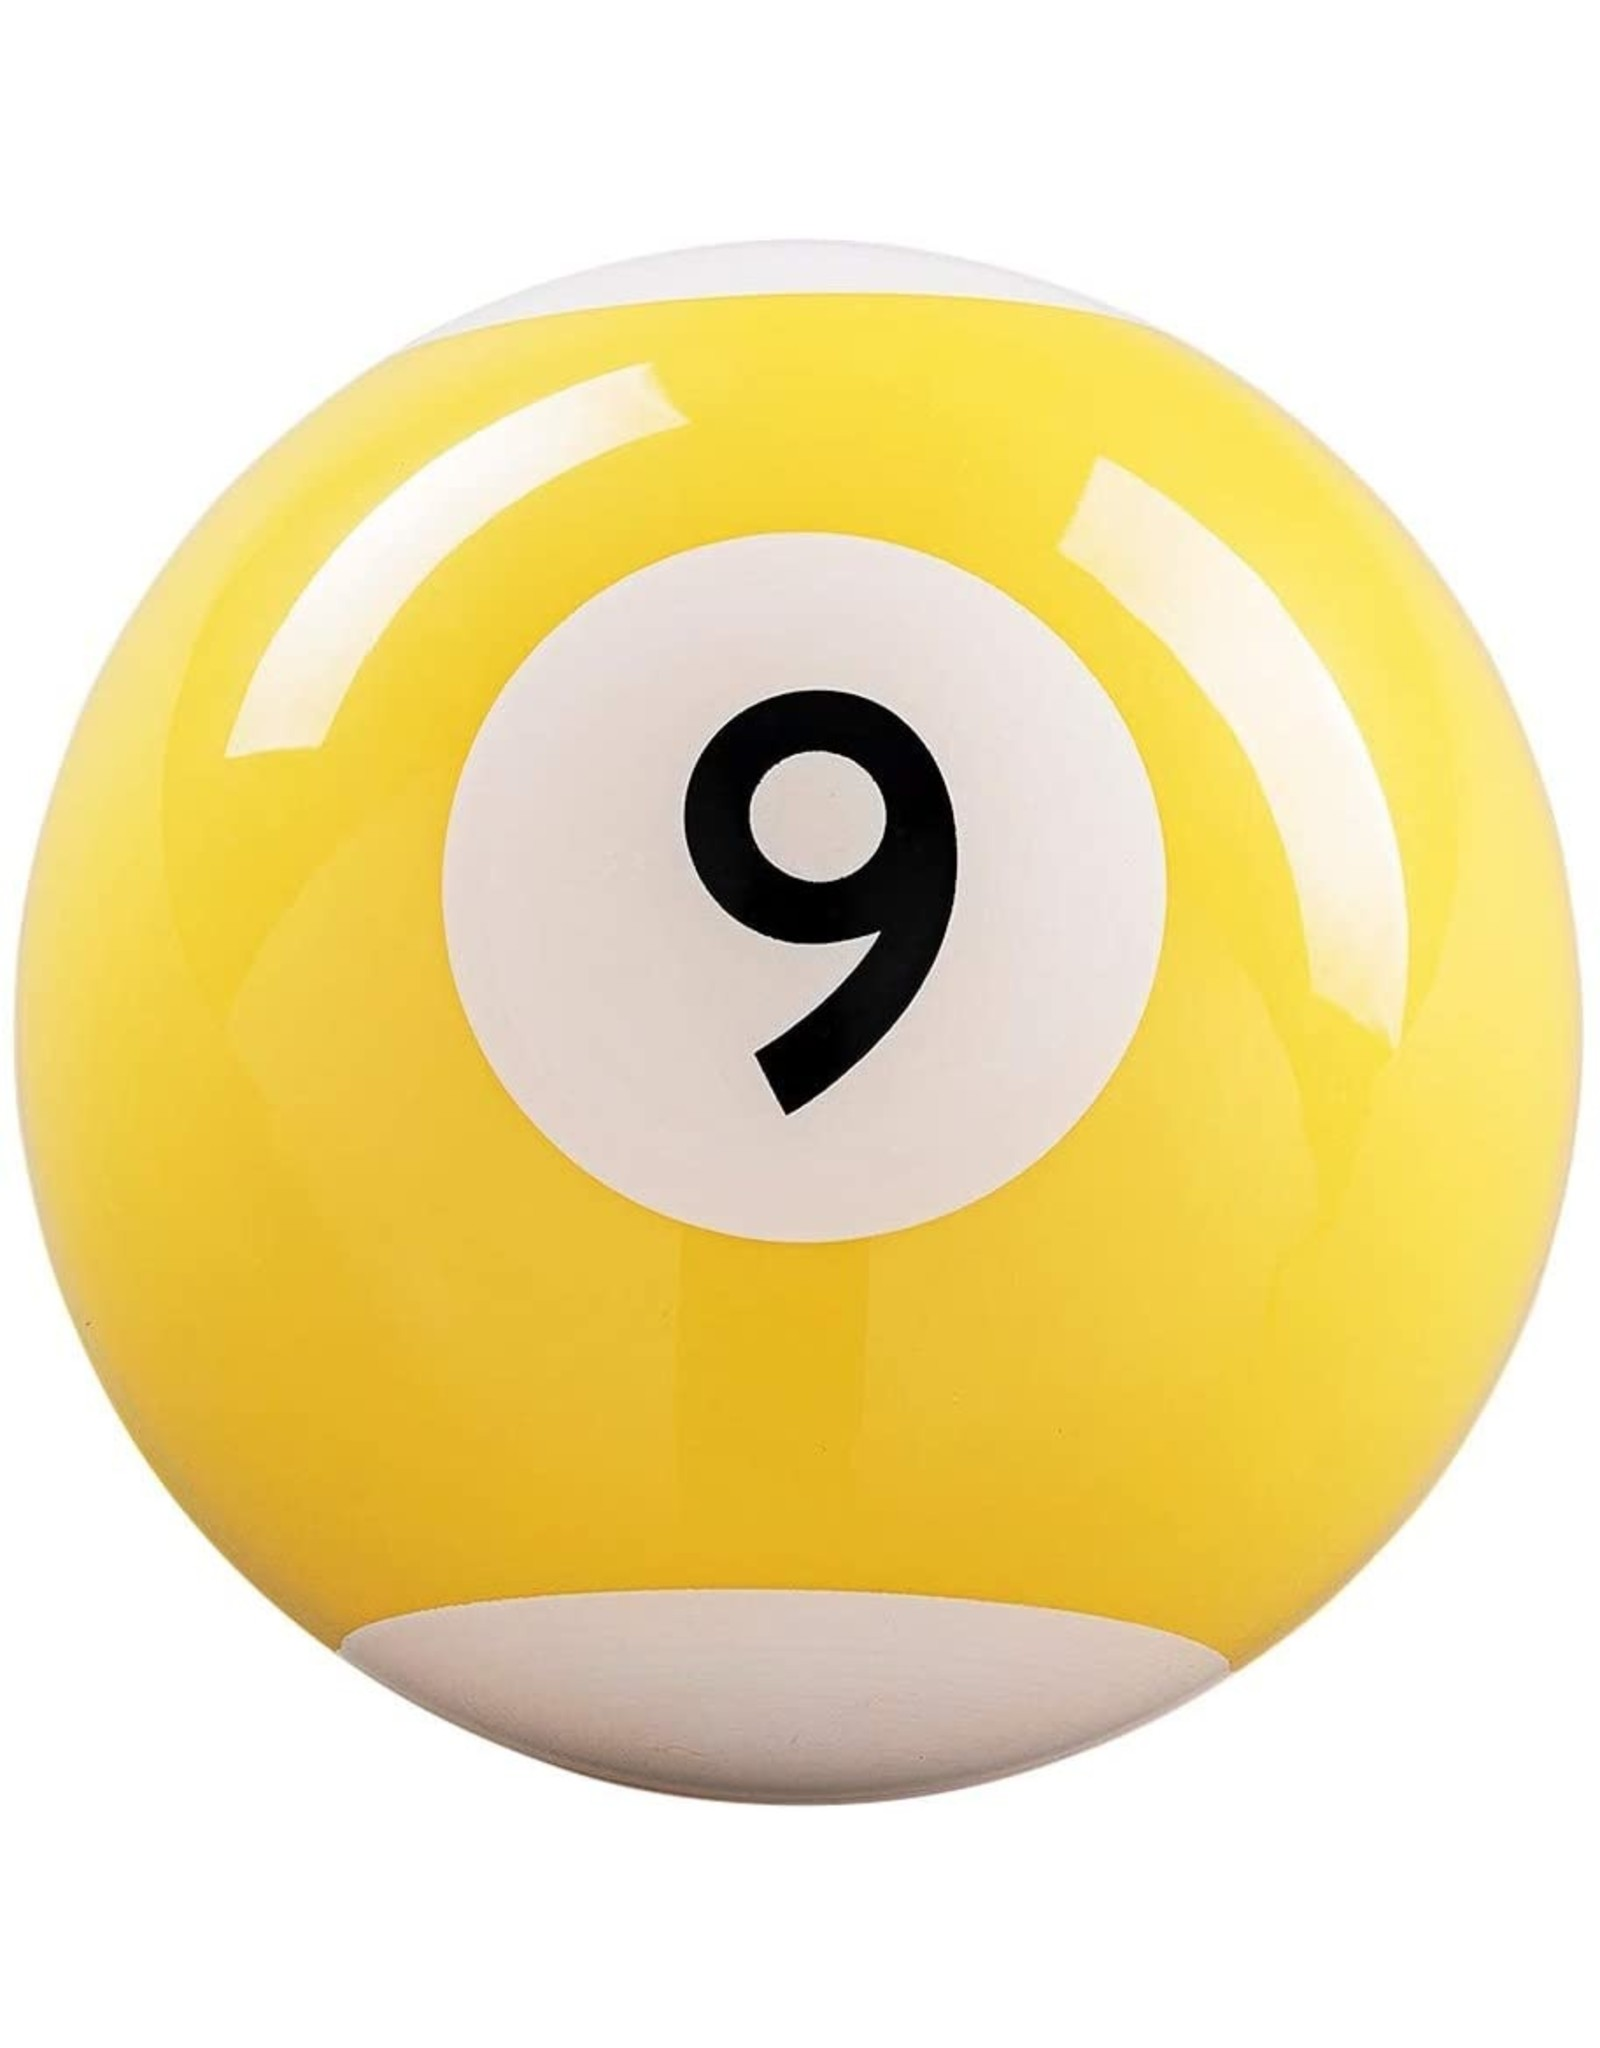 Ridley's® Sarcastic 9 Ball